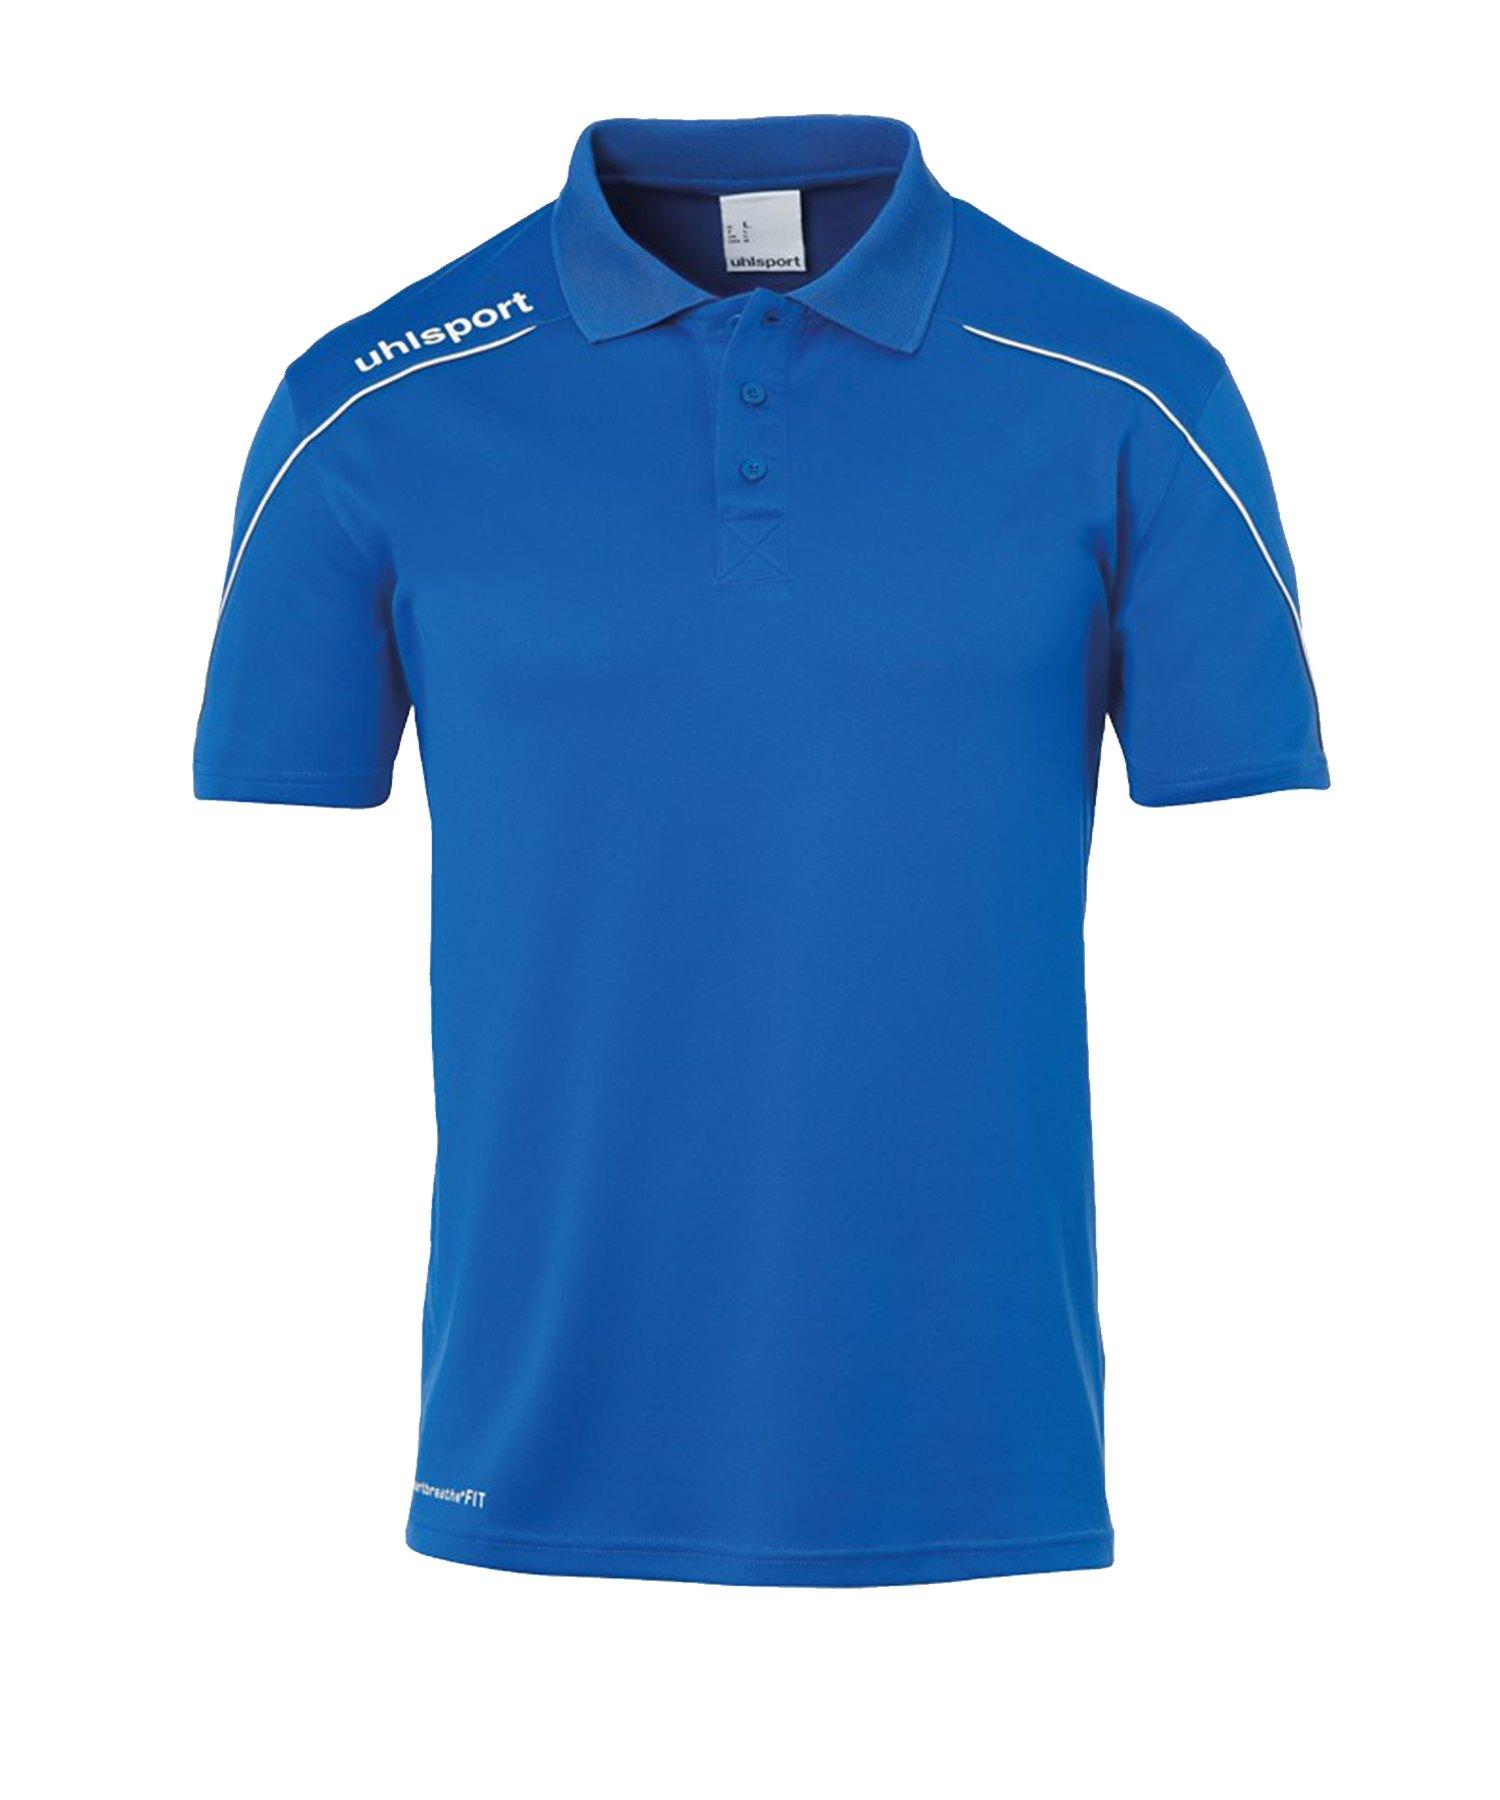 Uhlsport Stream 22 Poloshirt Kids Blau Weiss F03 - Blau